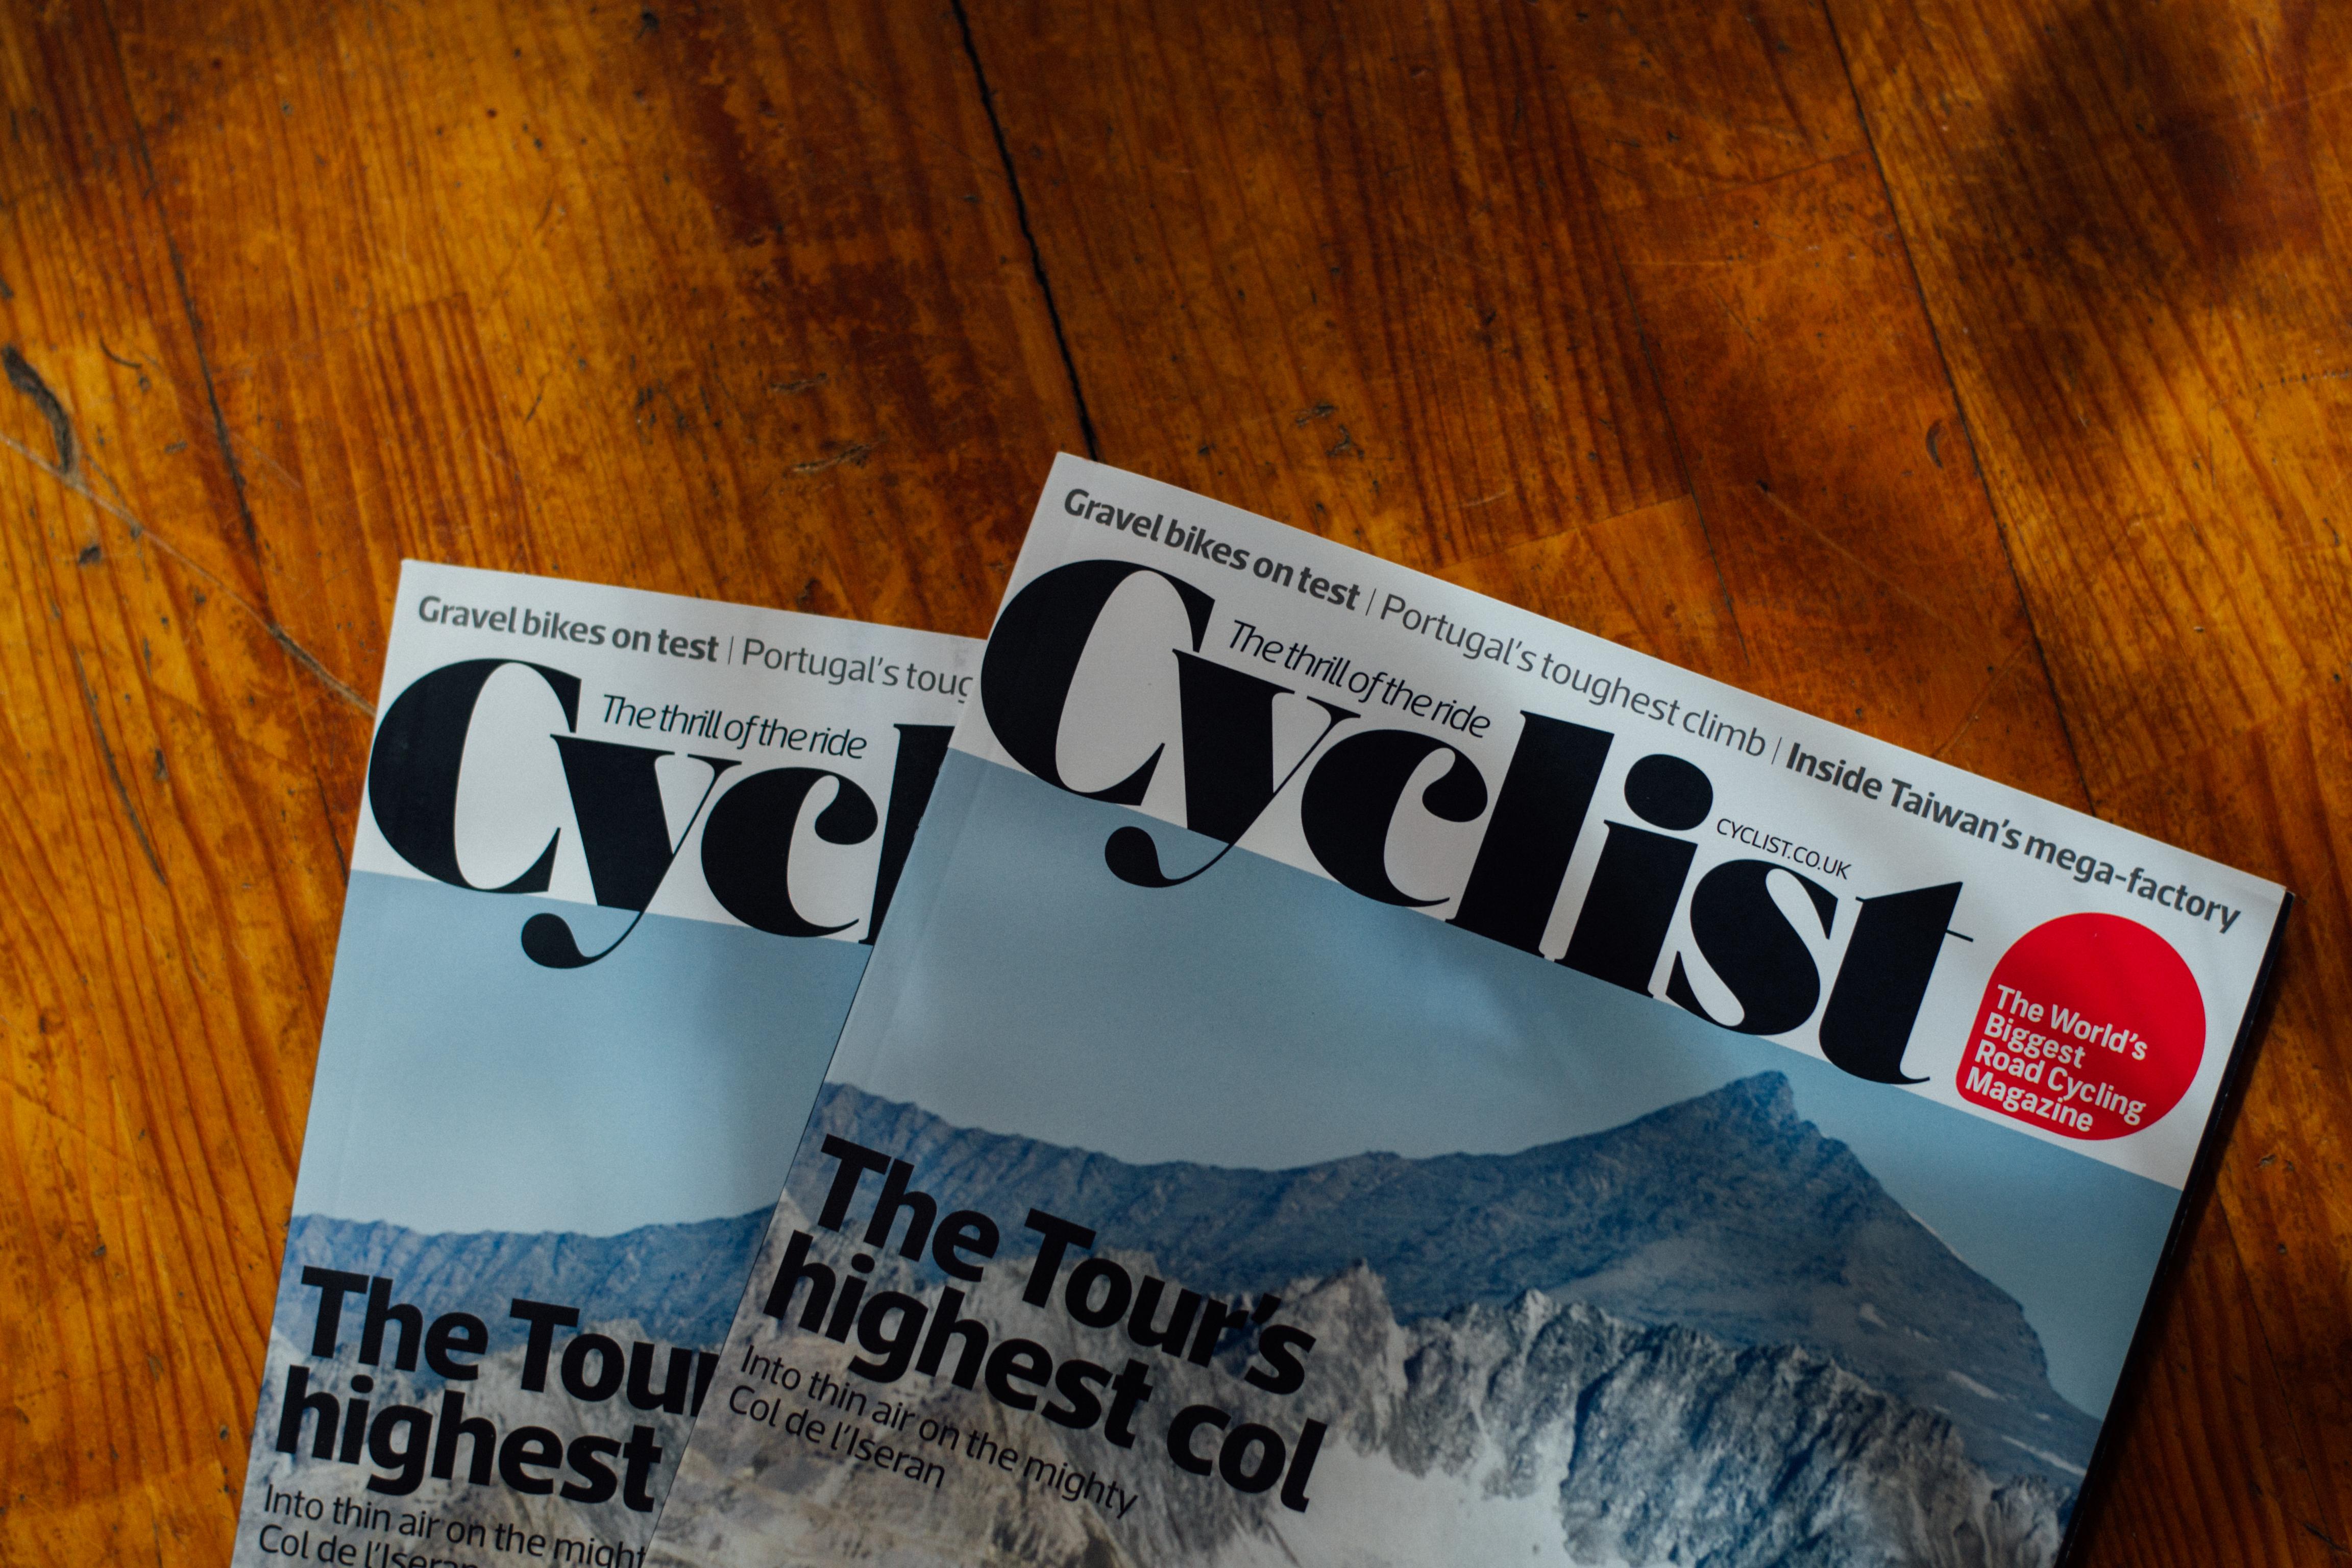 129c983f4 GALERIA: SERRA DA ESTRELA BRILHA NA CYCLIST | Velo Culture